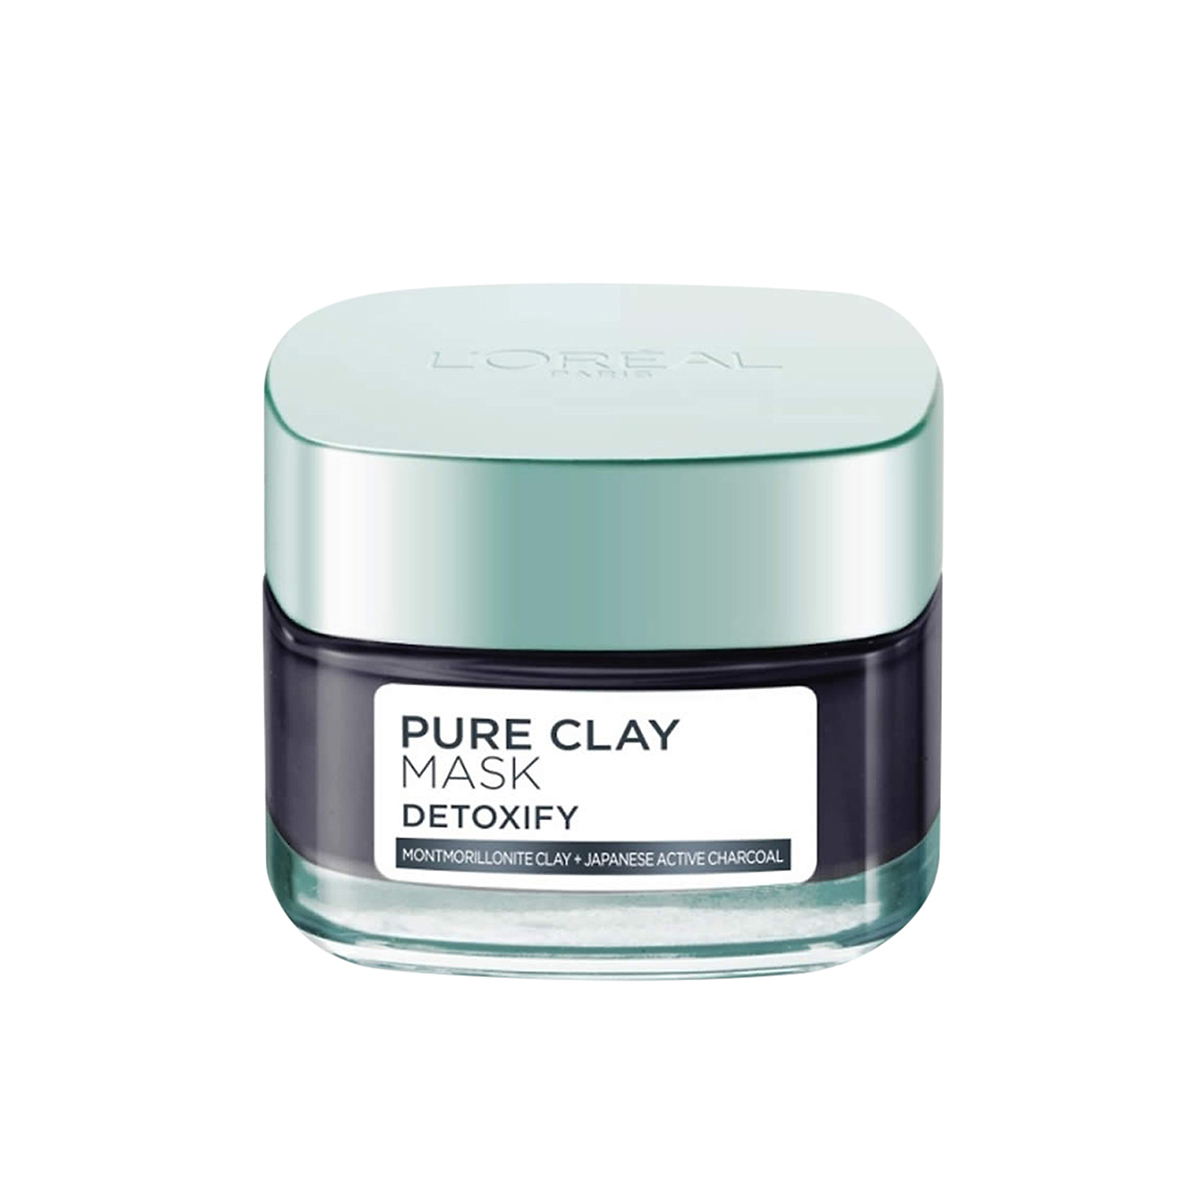 Mặt nạ đất sét Pure Clay Mask Detoxify